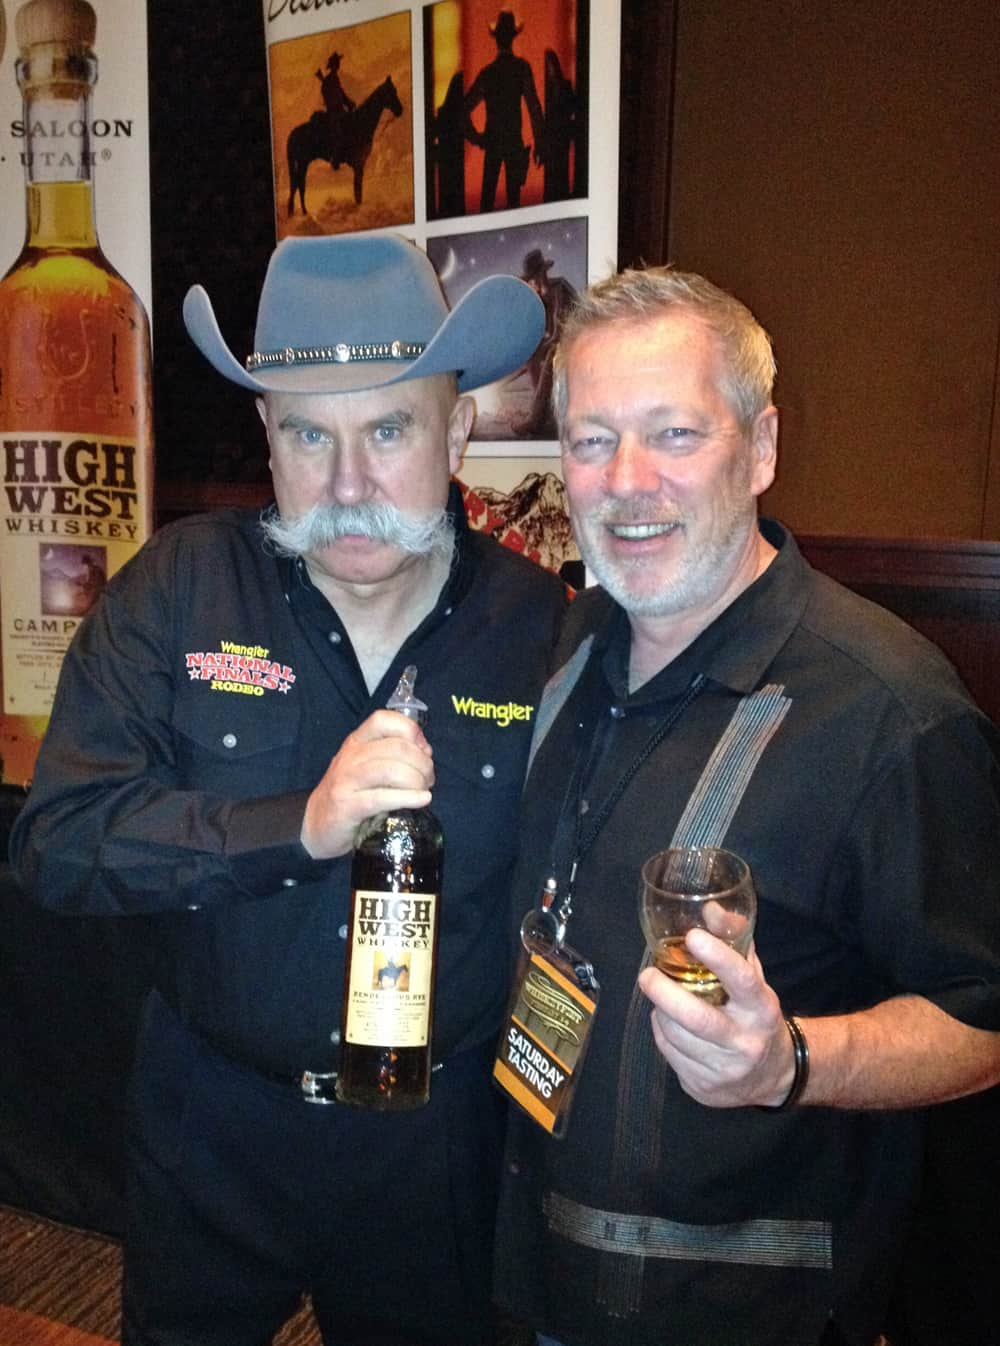 WhiskeyFest 2014 - High West Dude, Las Vegas, NV